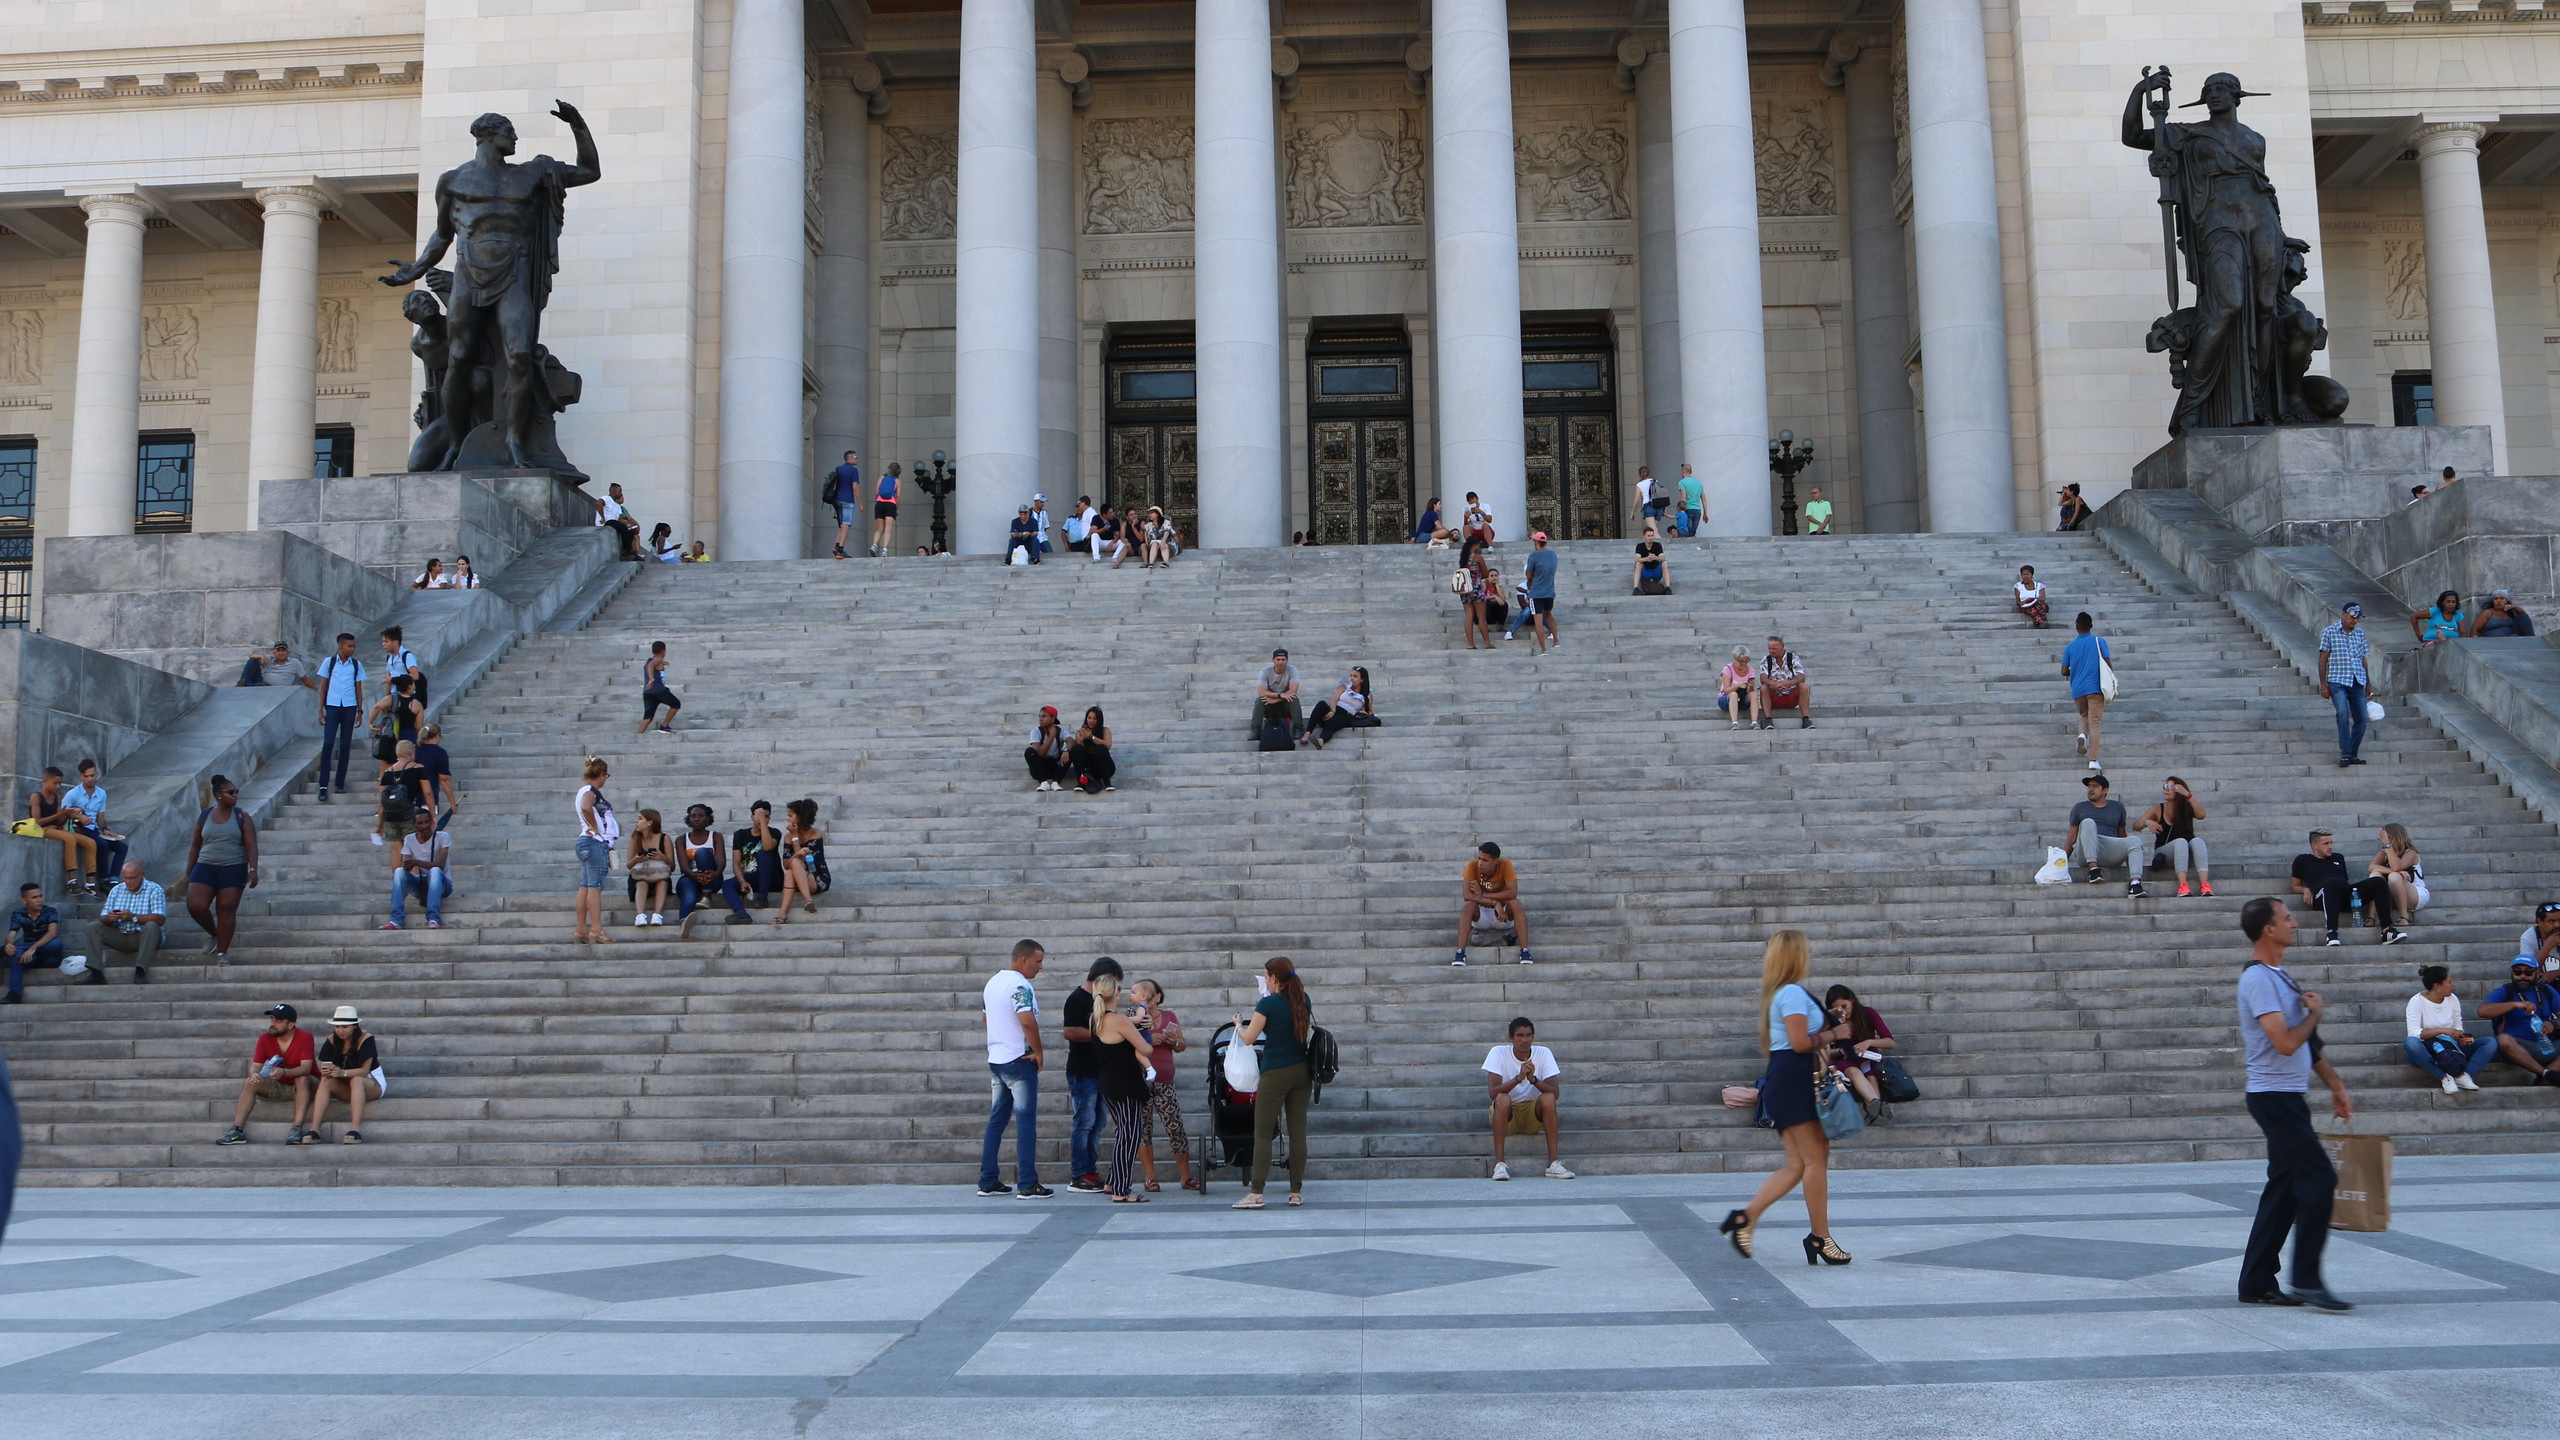 People sitting on the steps of El Capitolo in Havana, Cuba.